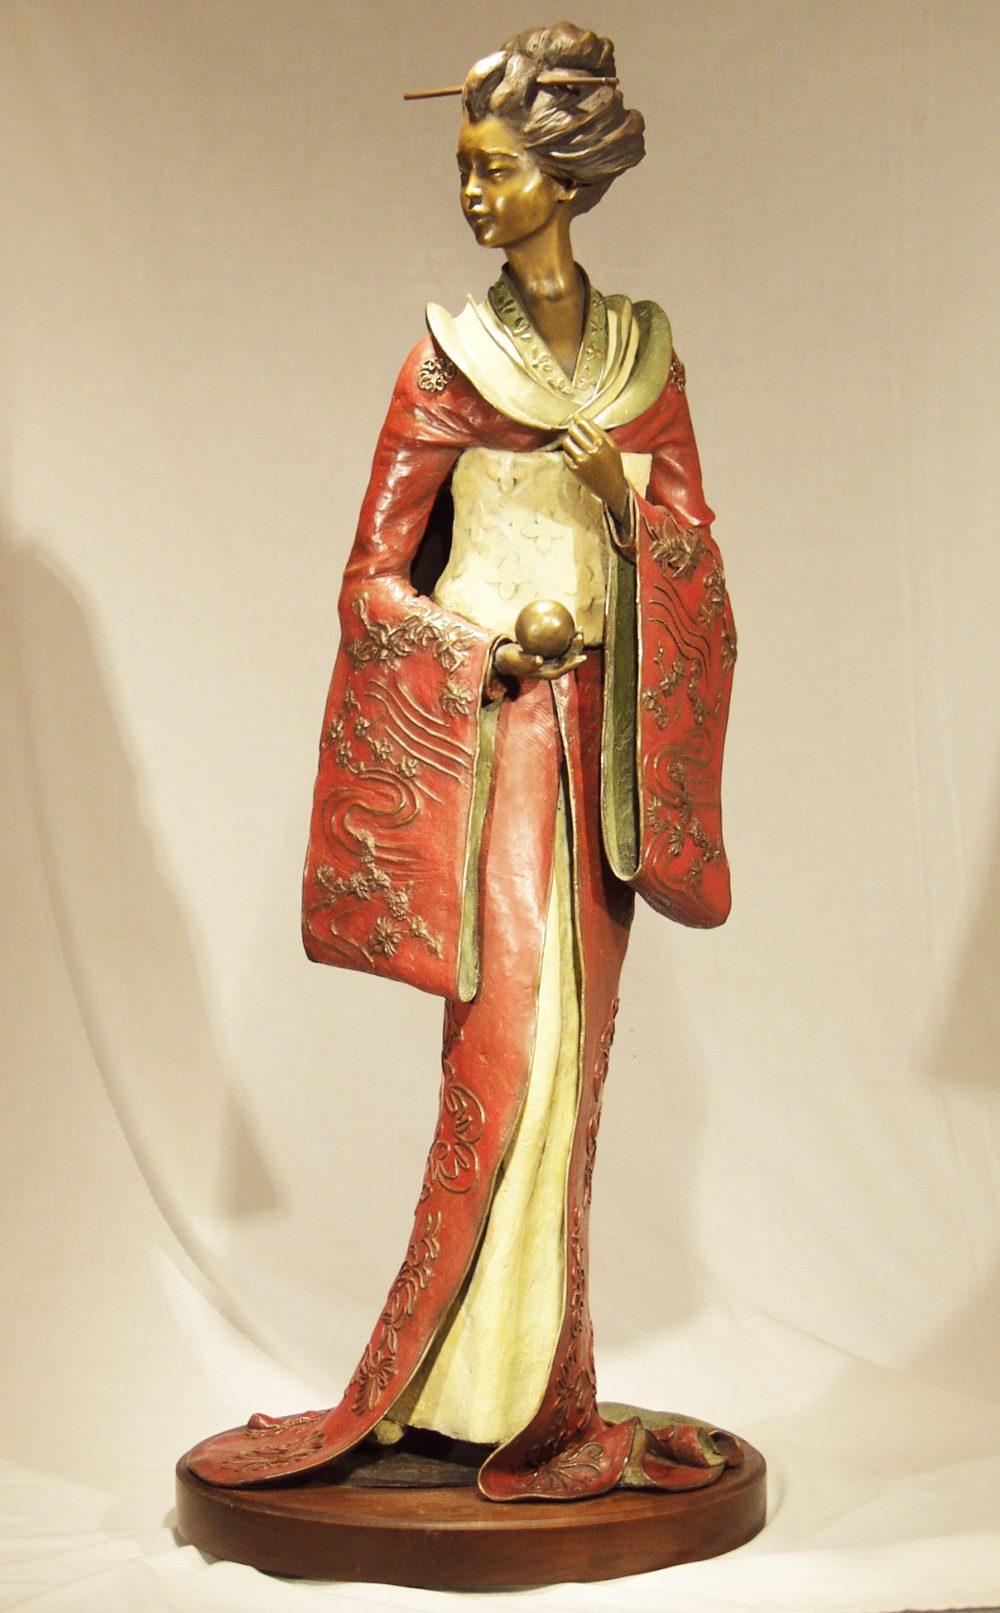 Geisha Elegance | Susaane Vertel | Sculpture-Exposures International Gallery of Fine Art - Sedona AZ